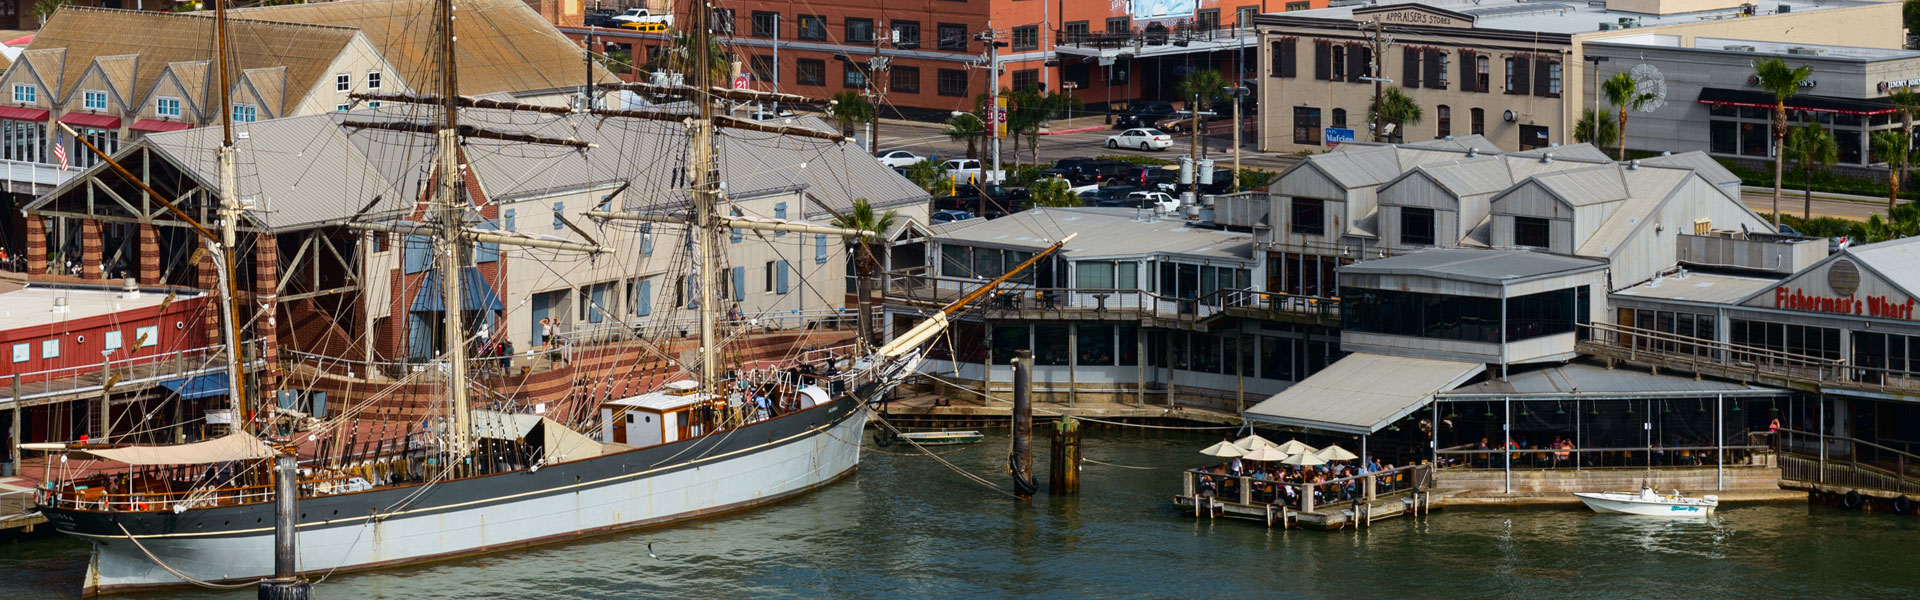 Fisherman's Wharf, Galveston TX